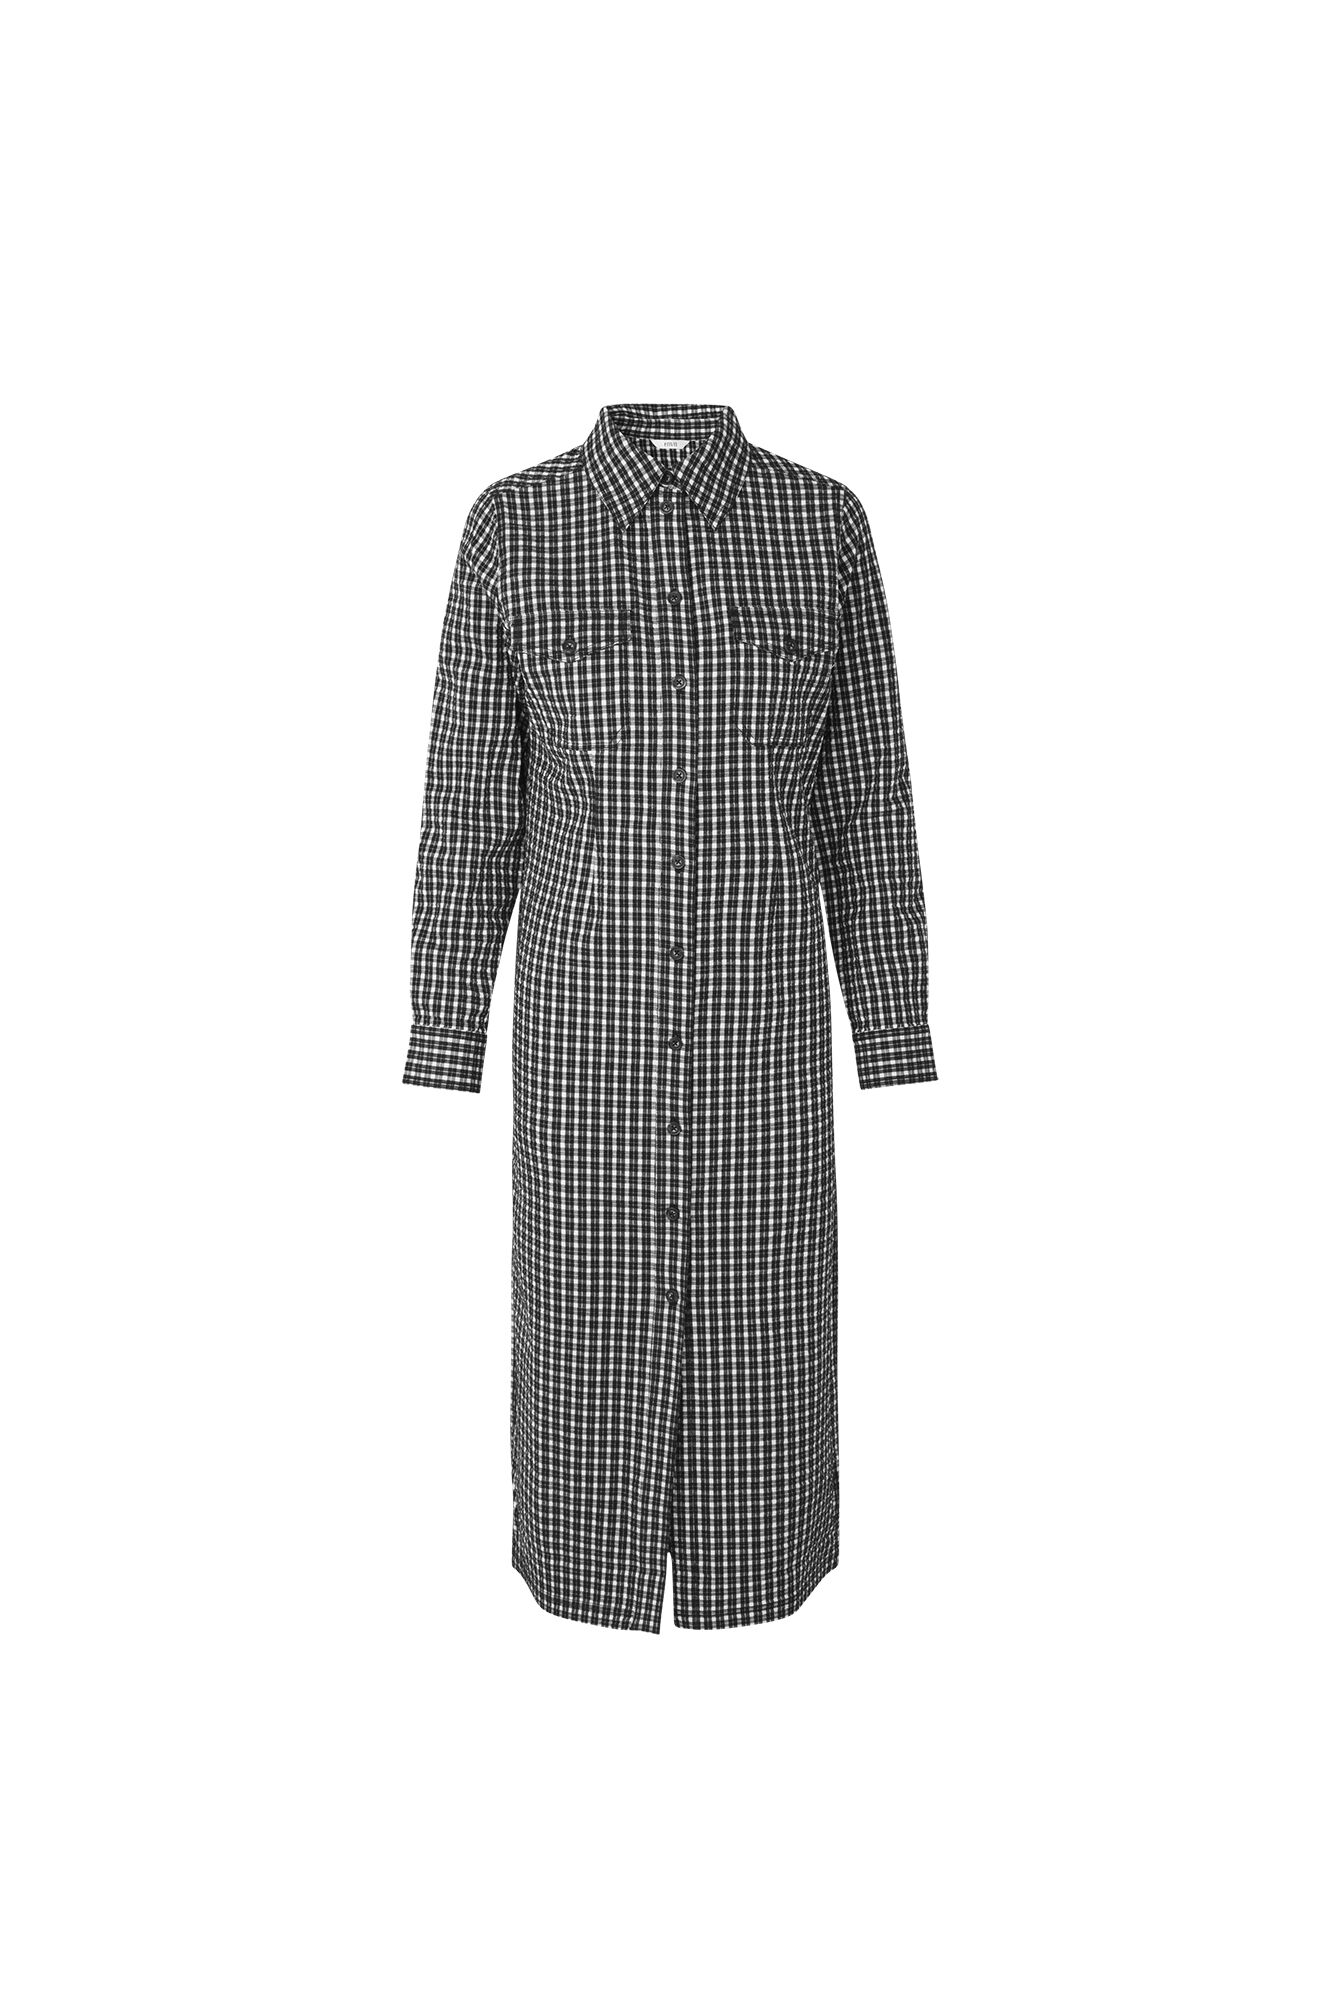 ENHAZEL LS DRESS 6661